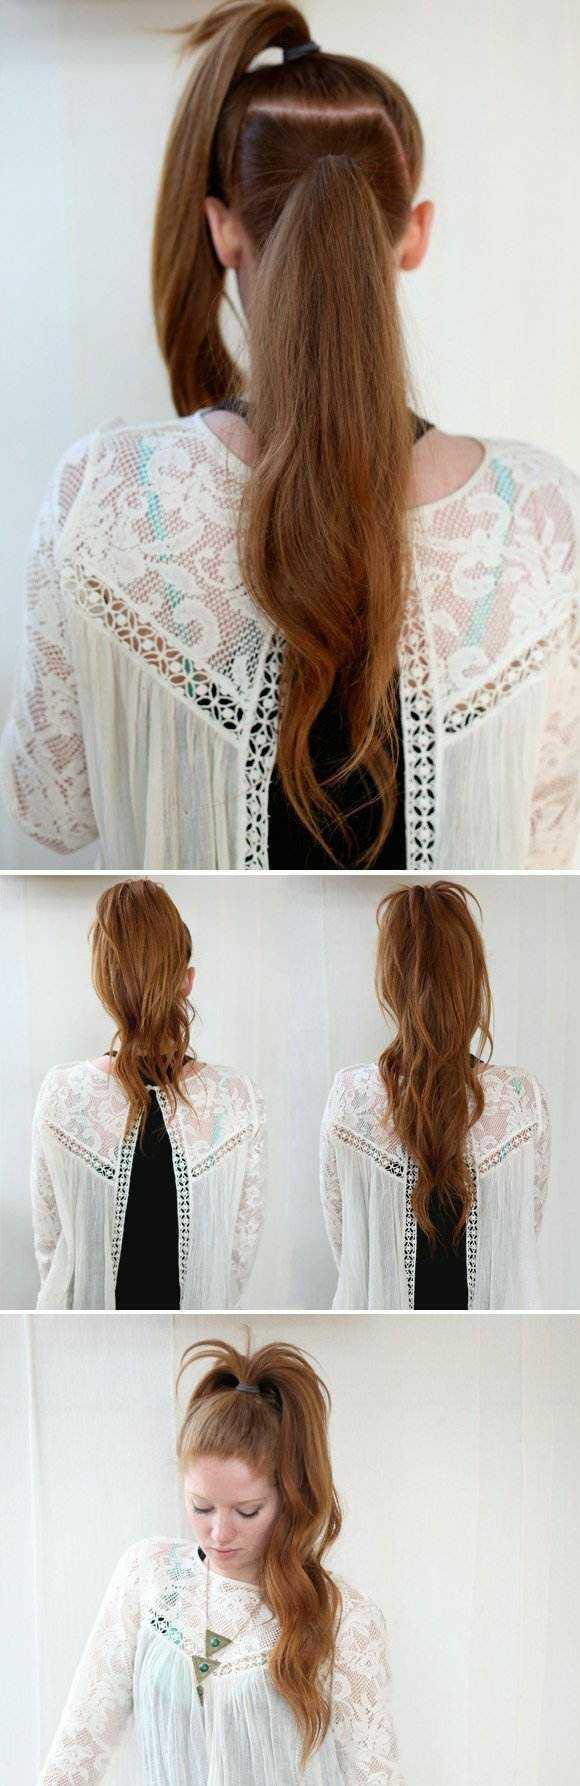 peinados rapidos ideas creativa peinado interesante